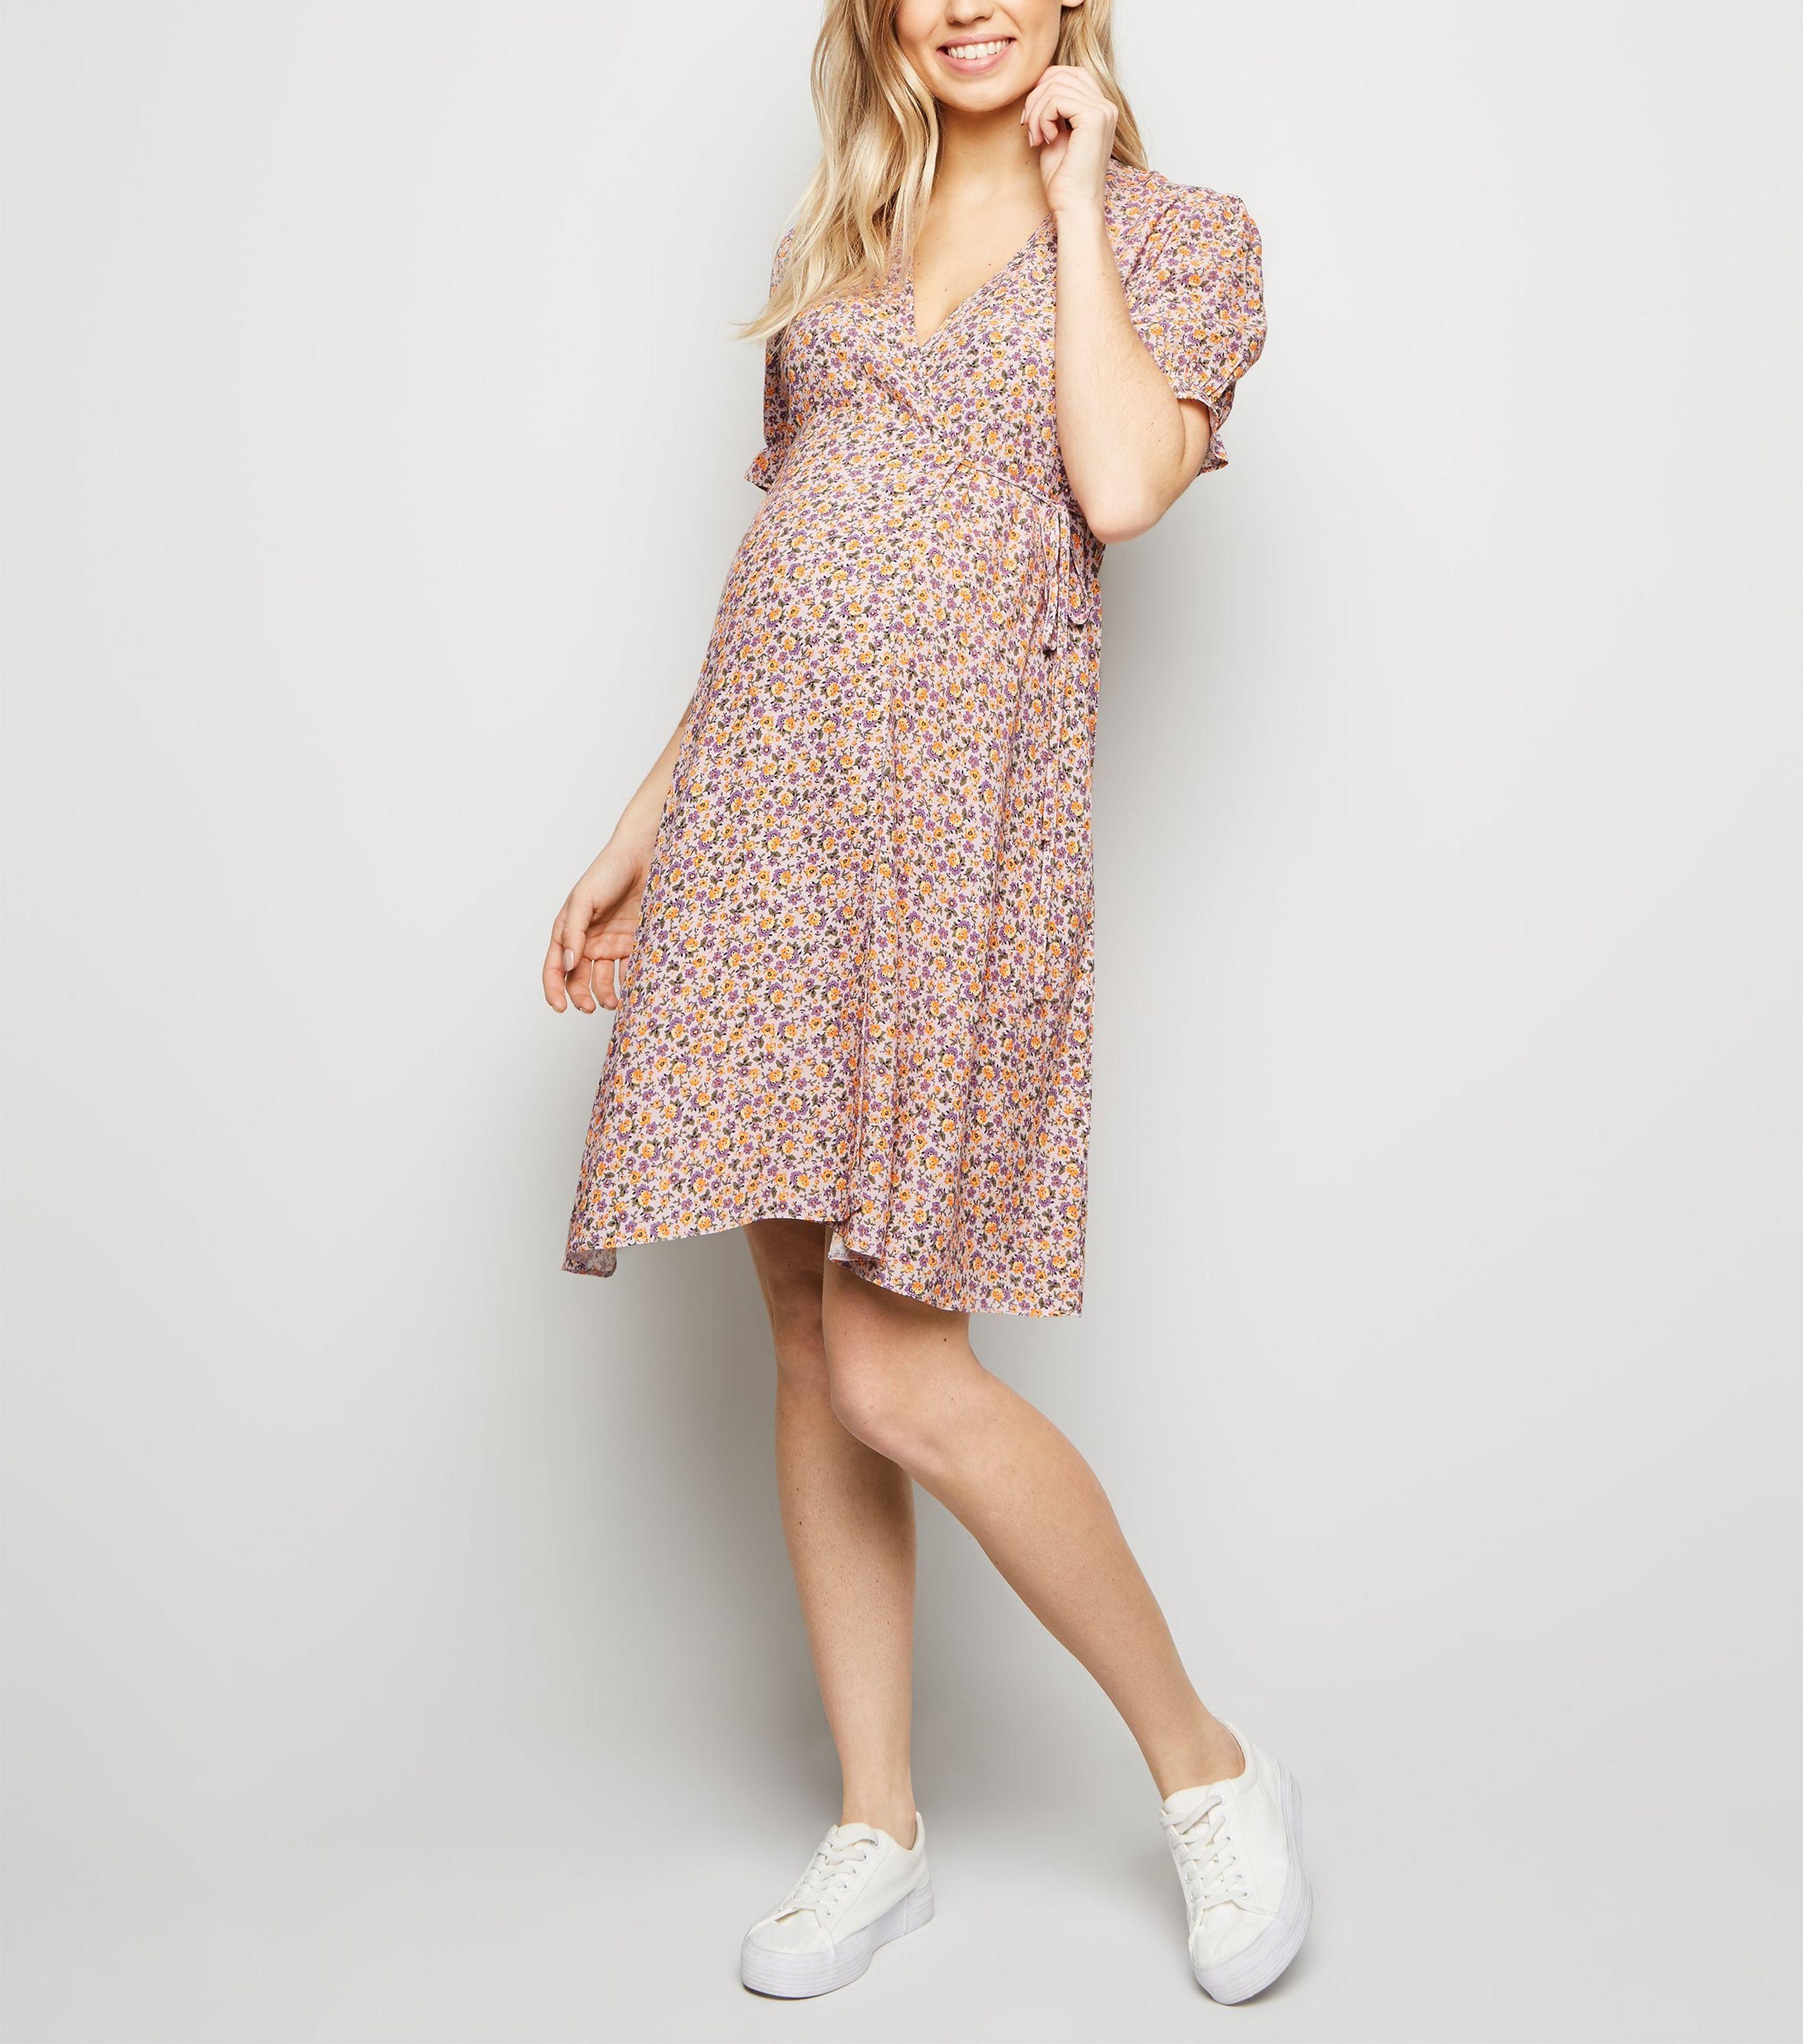 38f60ad1970b1 New Look Maternity Pink Floral Frill Hem Wrap Dress in Pink - Lyst